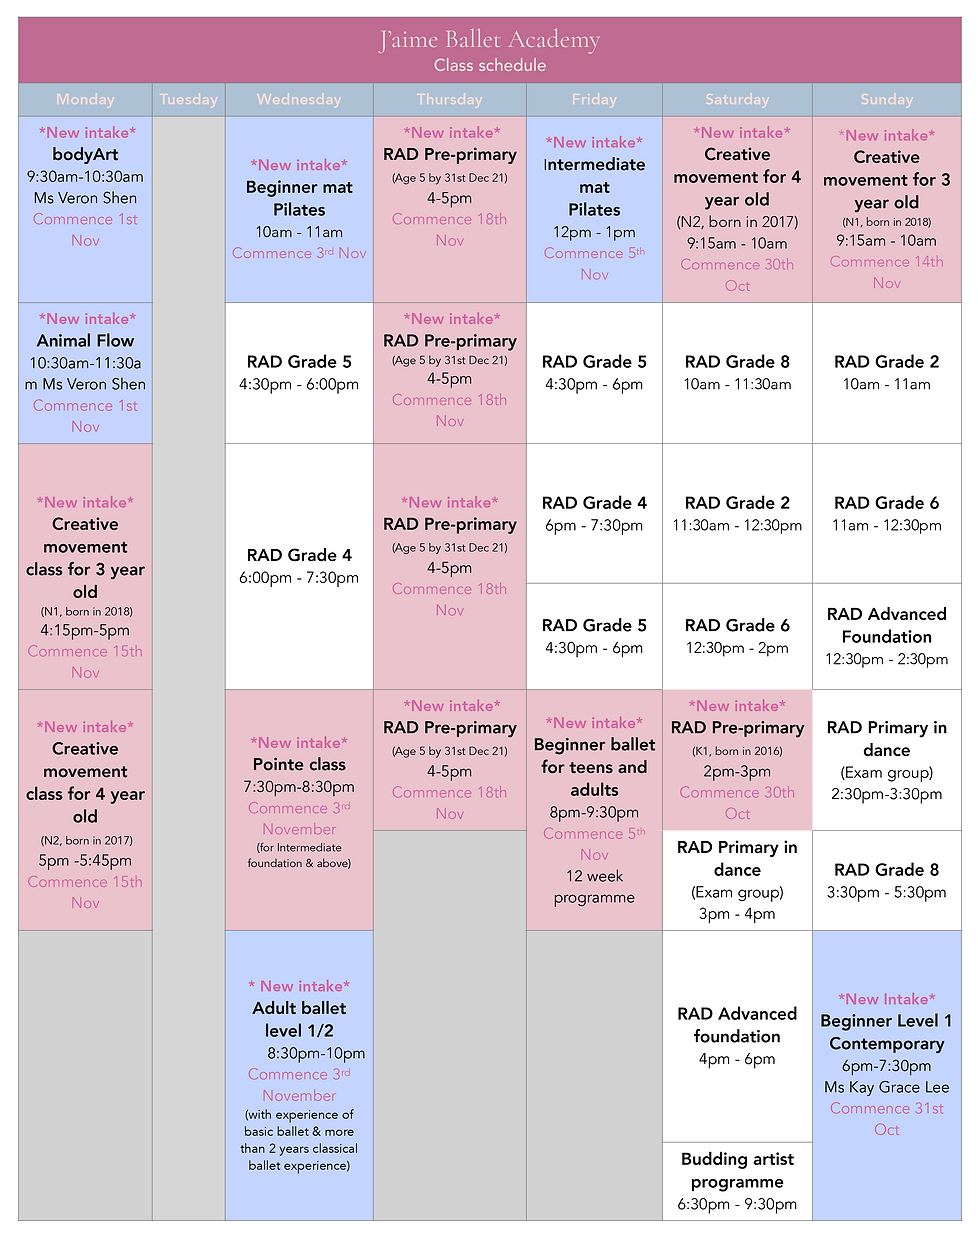 Schedule [Update] - 211021-08.png